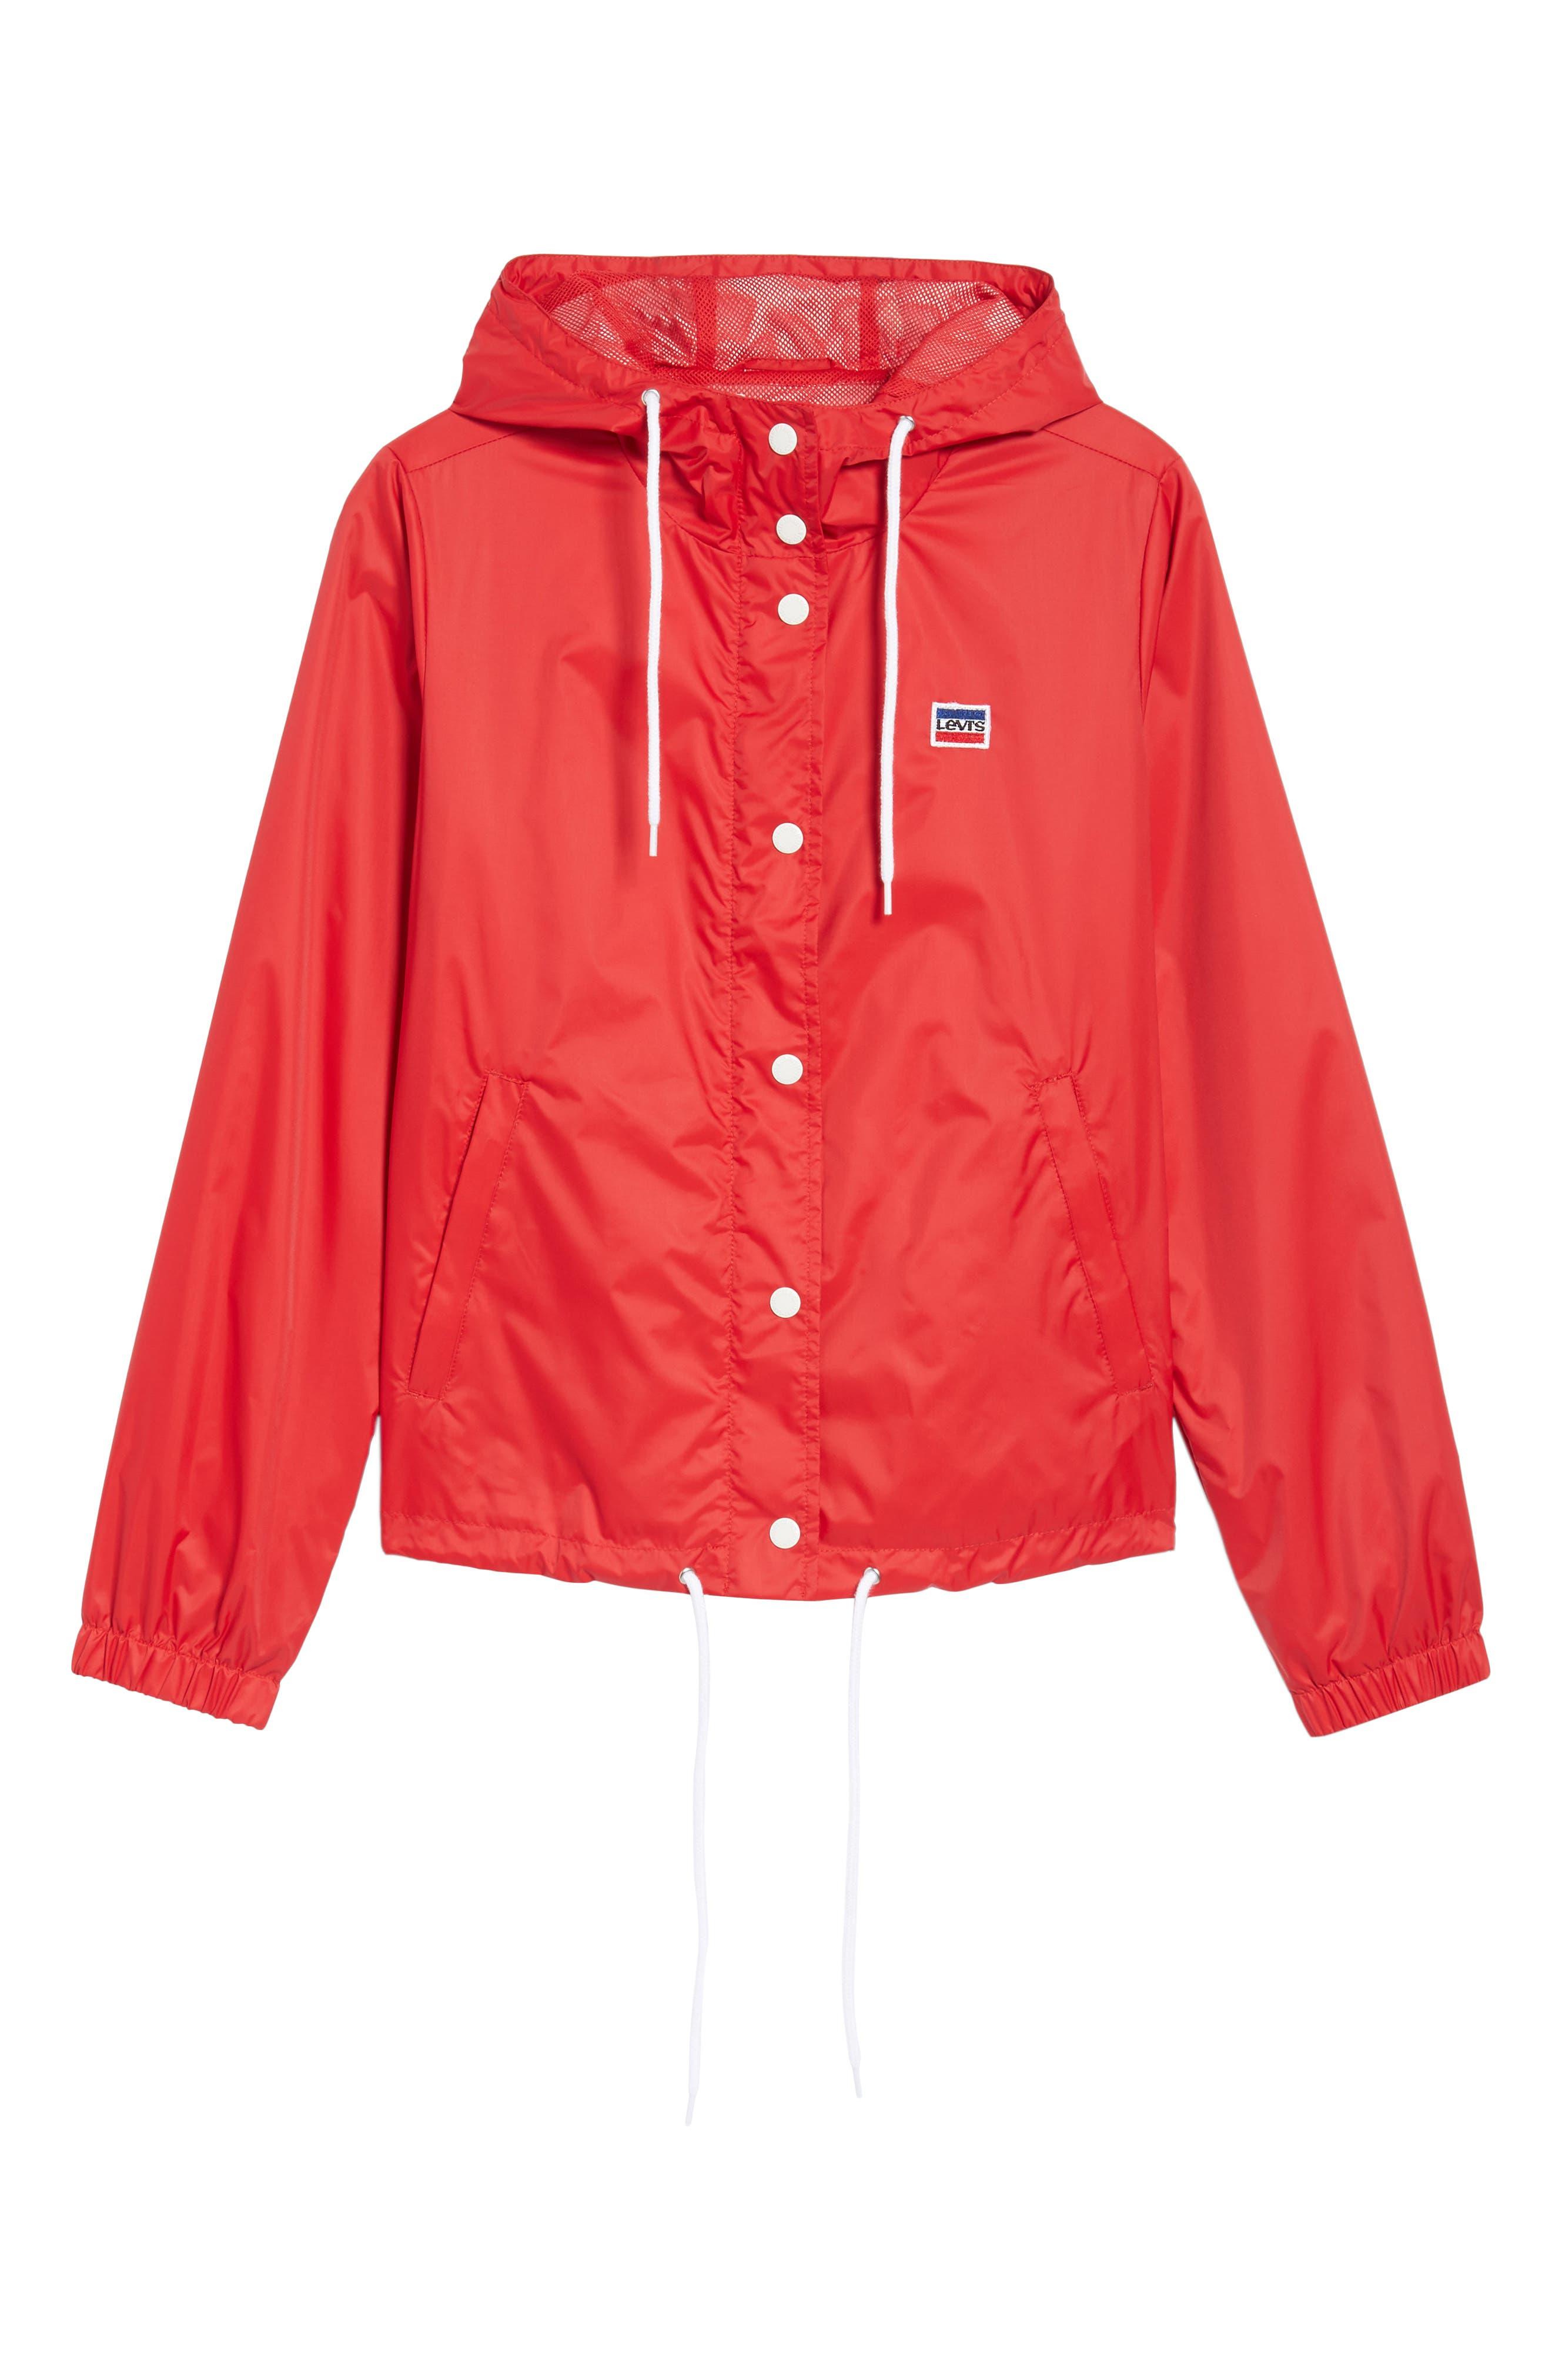 Retro Hooded Coach's Jacket,                             Alternate thumbnail 25, color,